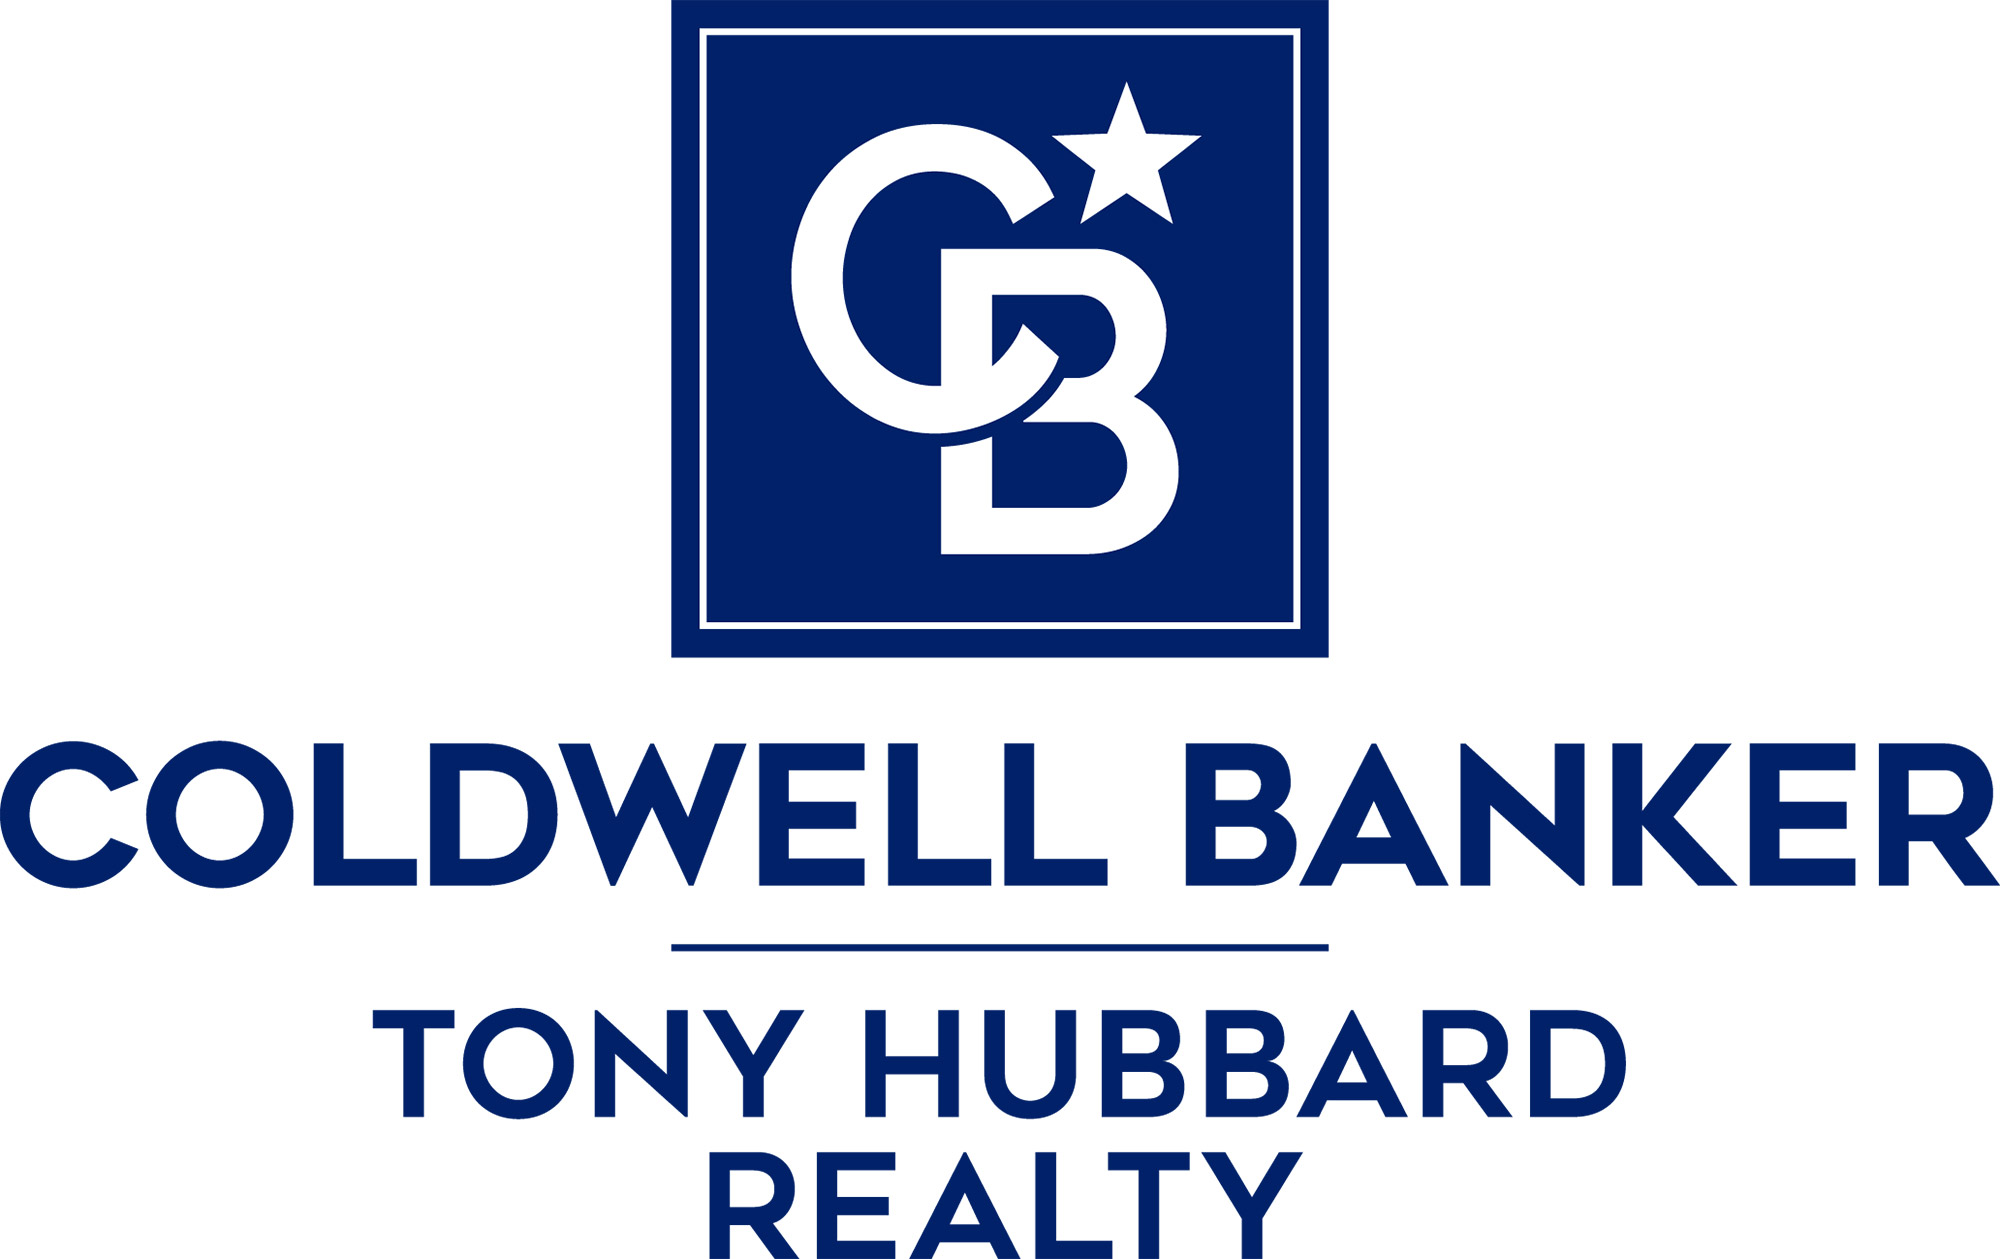 Coldwell Banker Tony Hubbard Logo